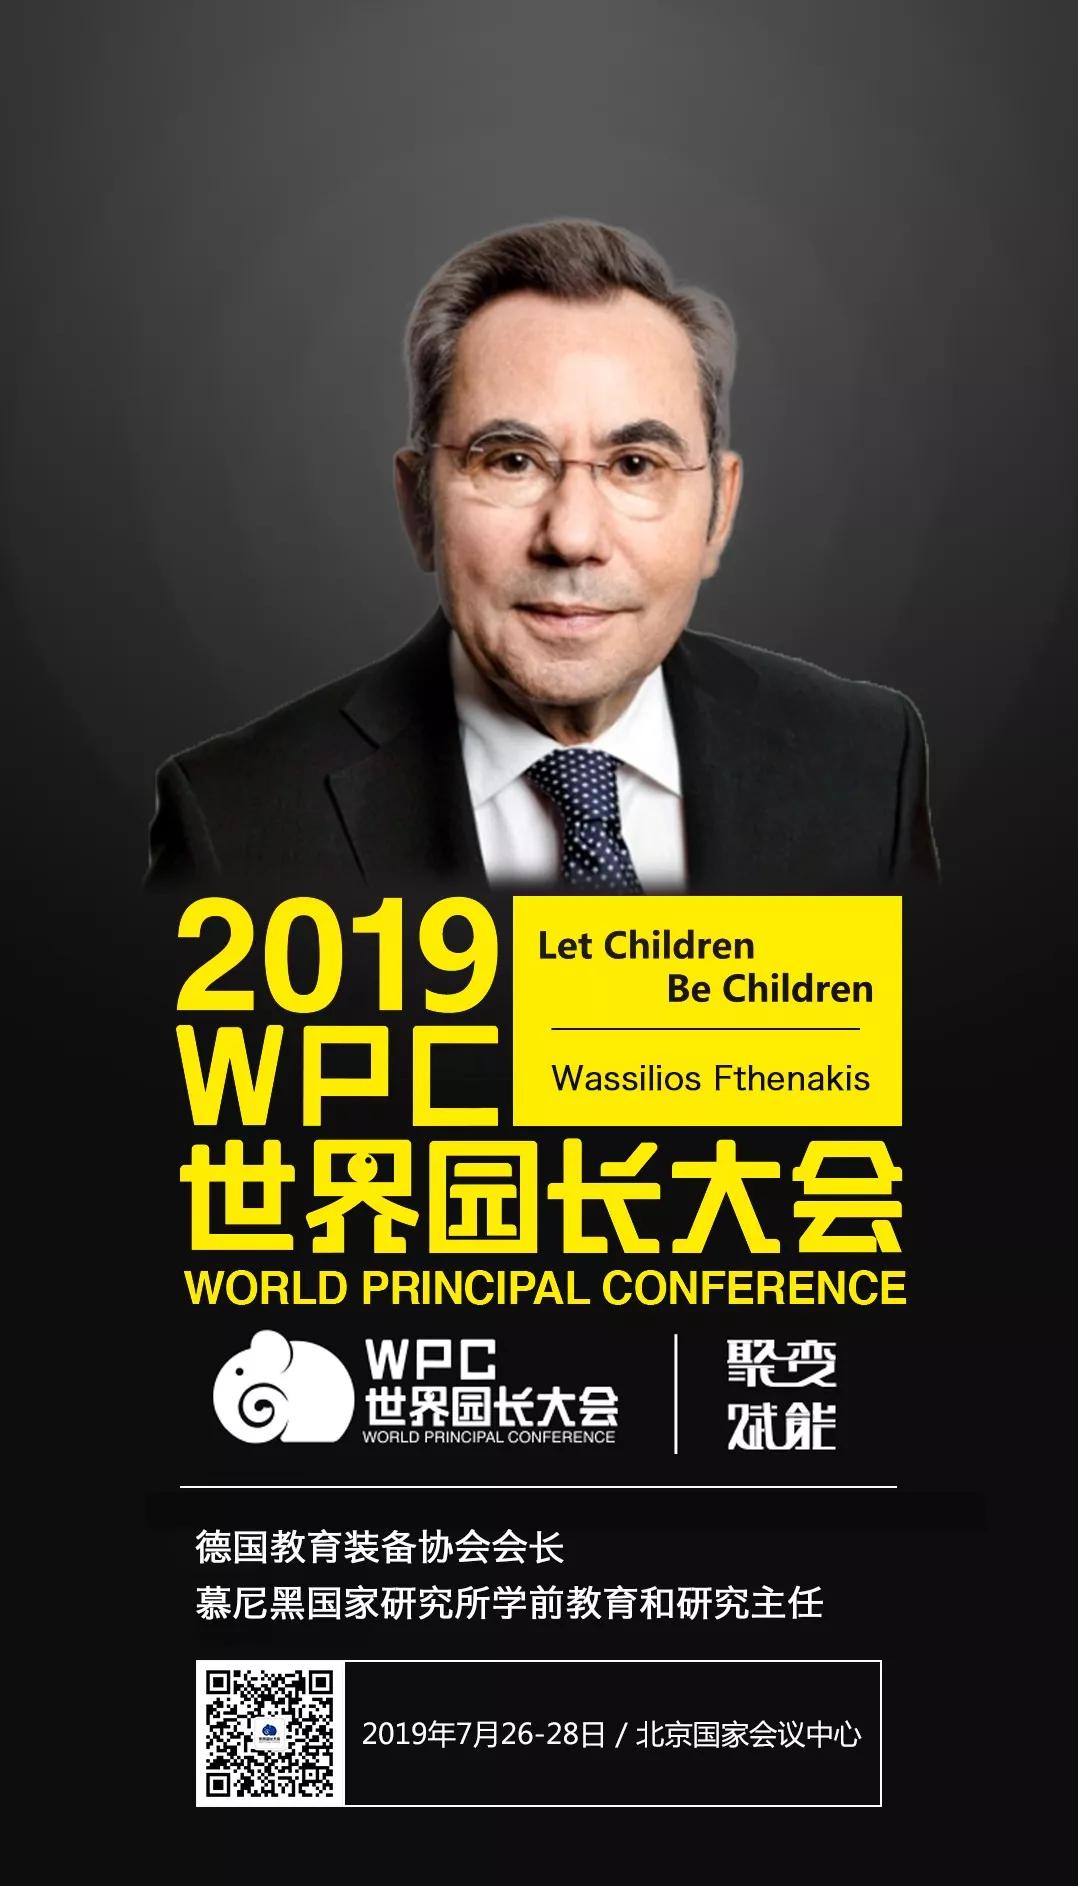 2019WPC世界园长大会主论坛专家